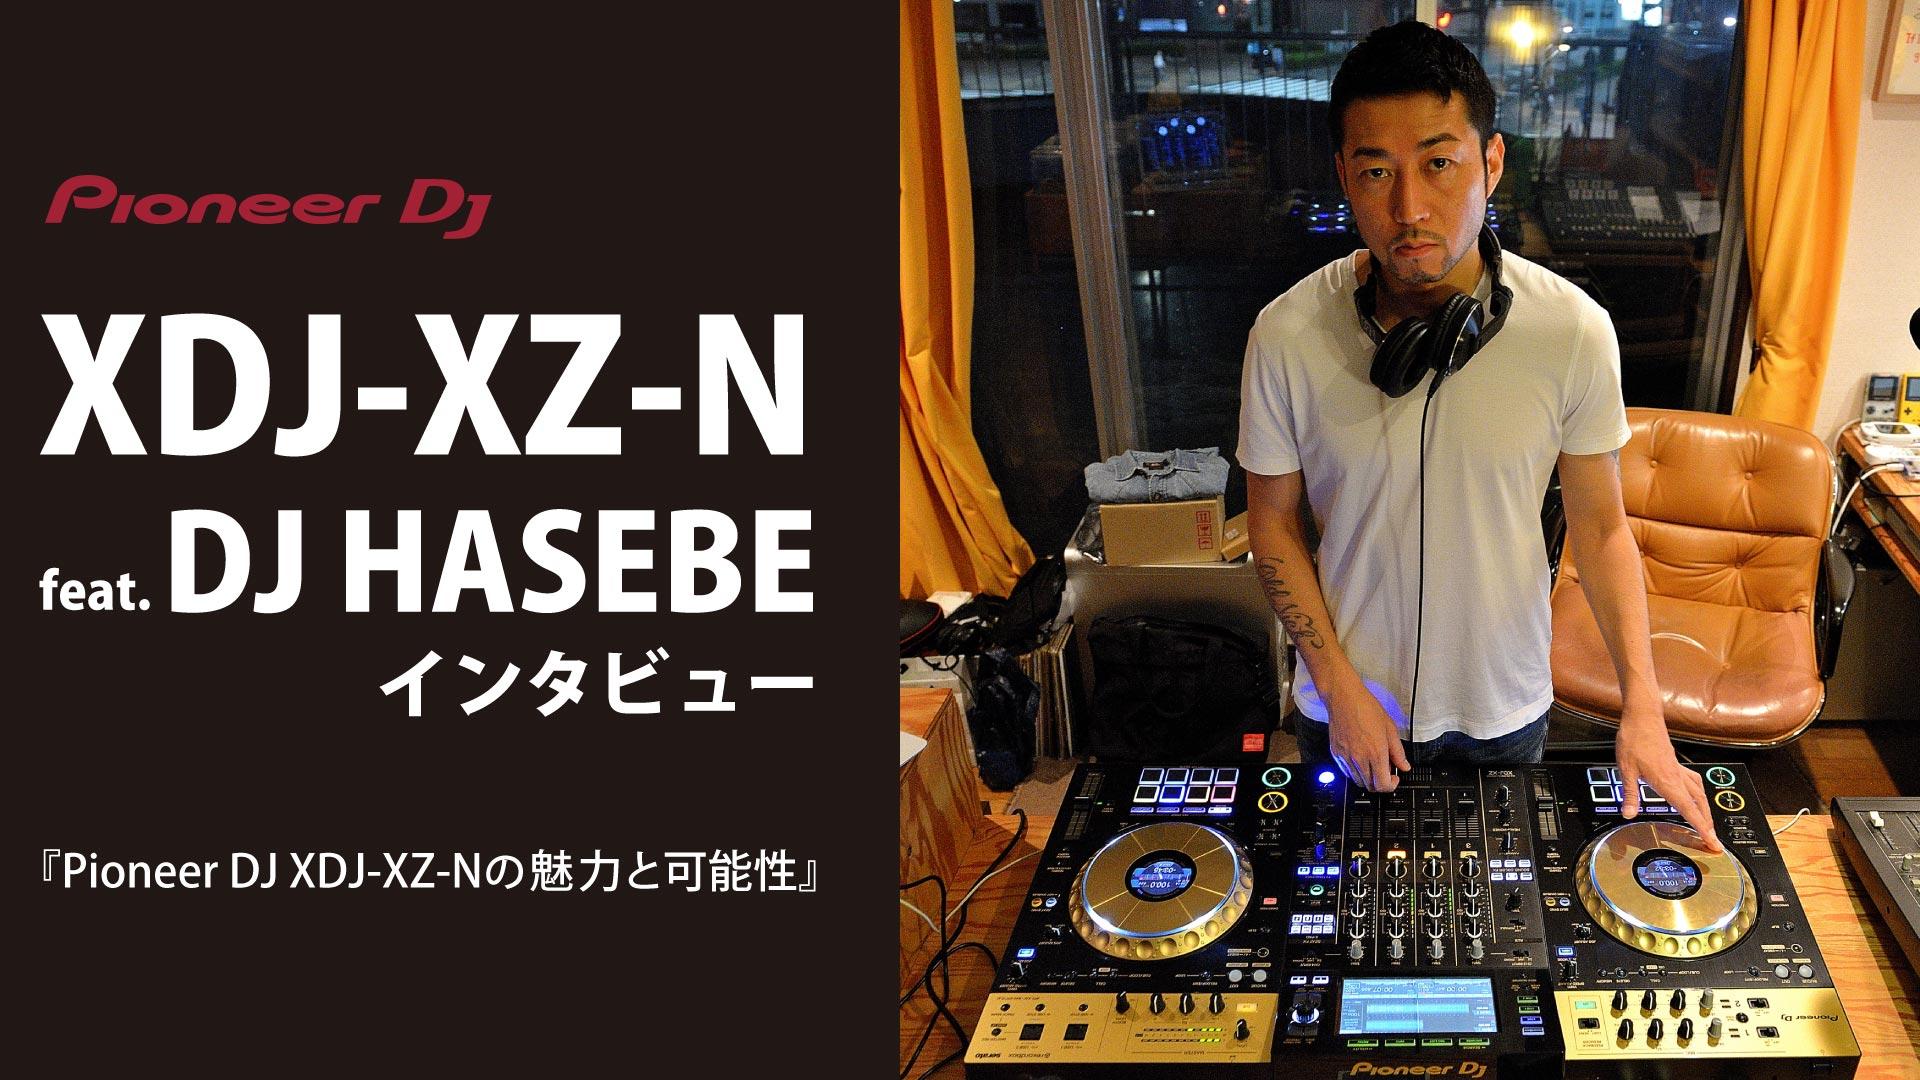 Pioneer DJ XDJ-XZ-N feat.DJ HASEBEインタビュー